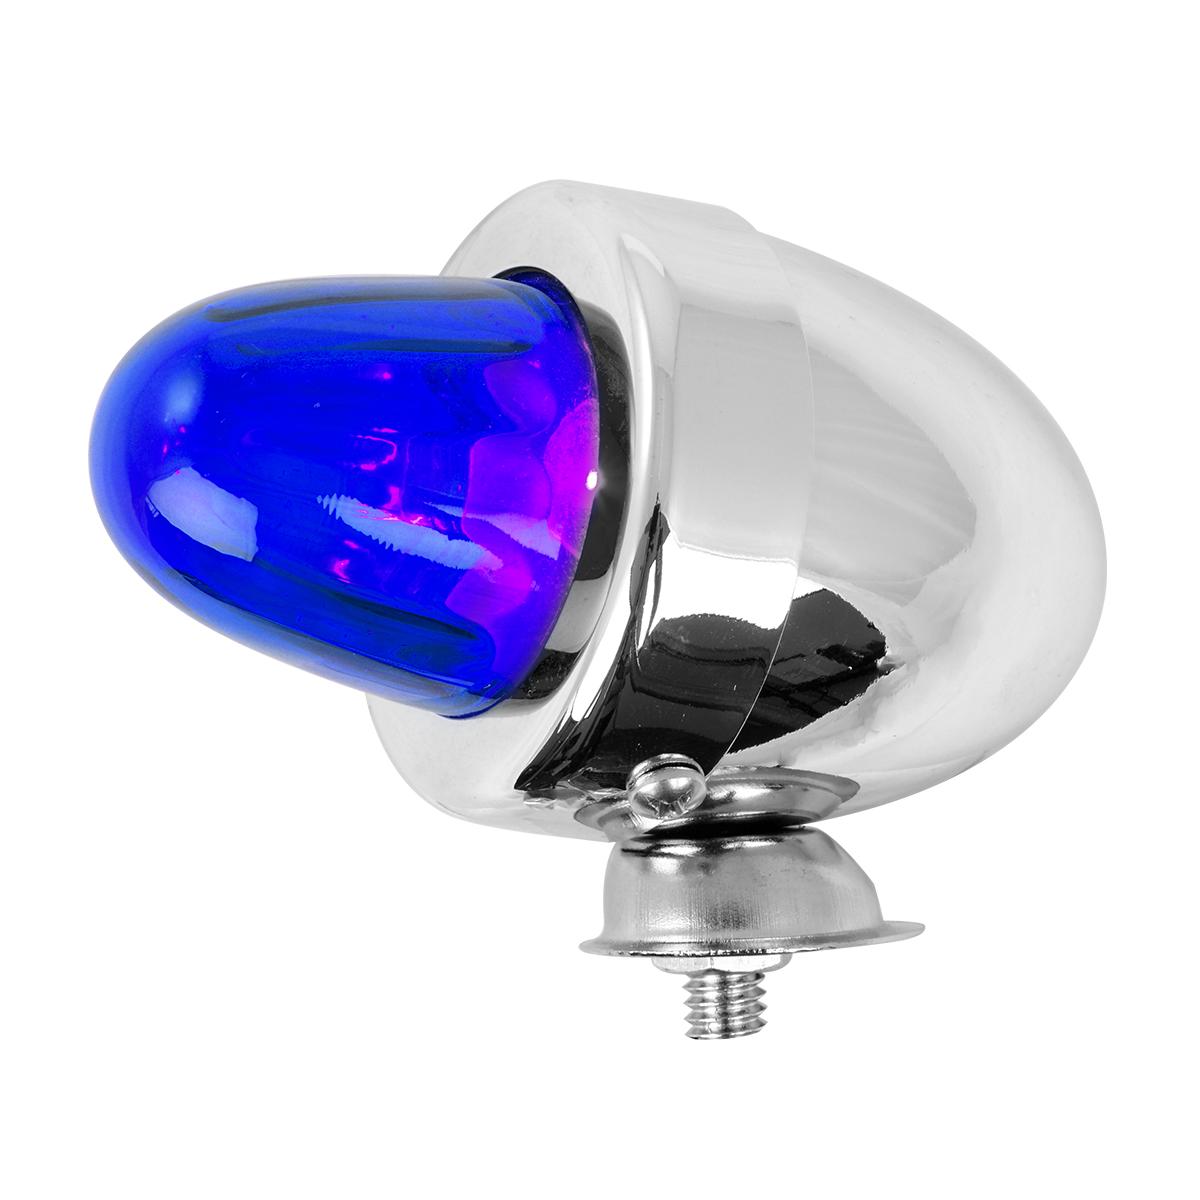 #80482 Bullet Shape Marker Light with Blue Glass Lens